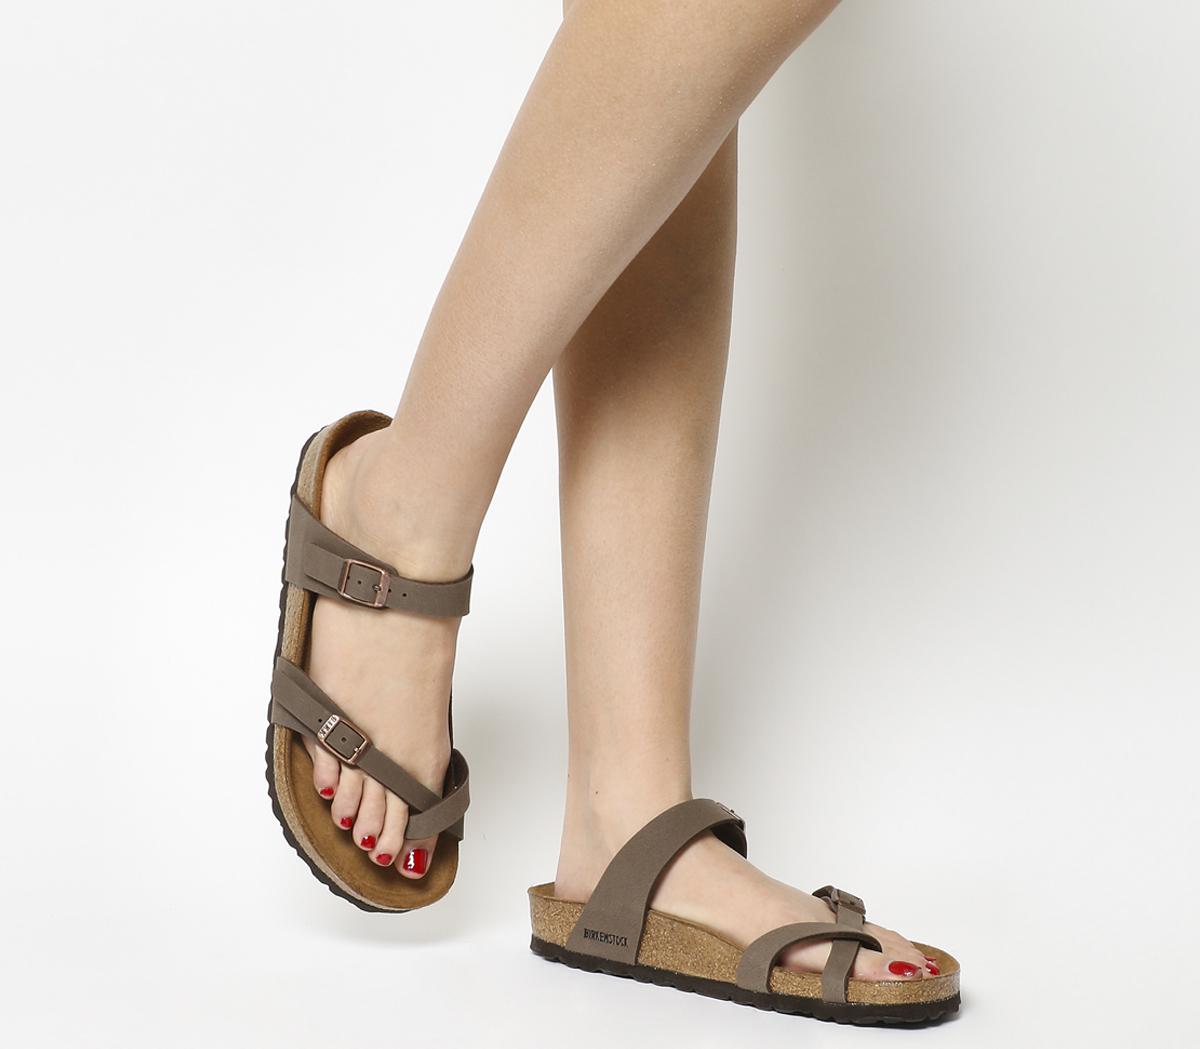 a8ec6ebaae18 Sentinel Womens Birkenstock Mayari Cross Strap Sandals MOCHA Sandals